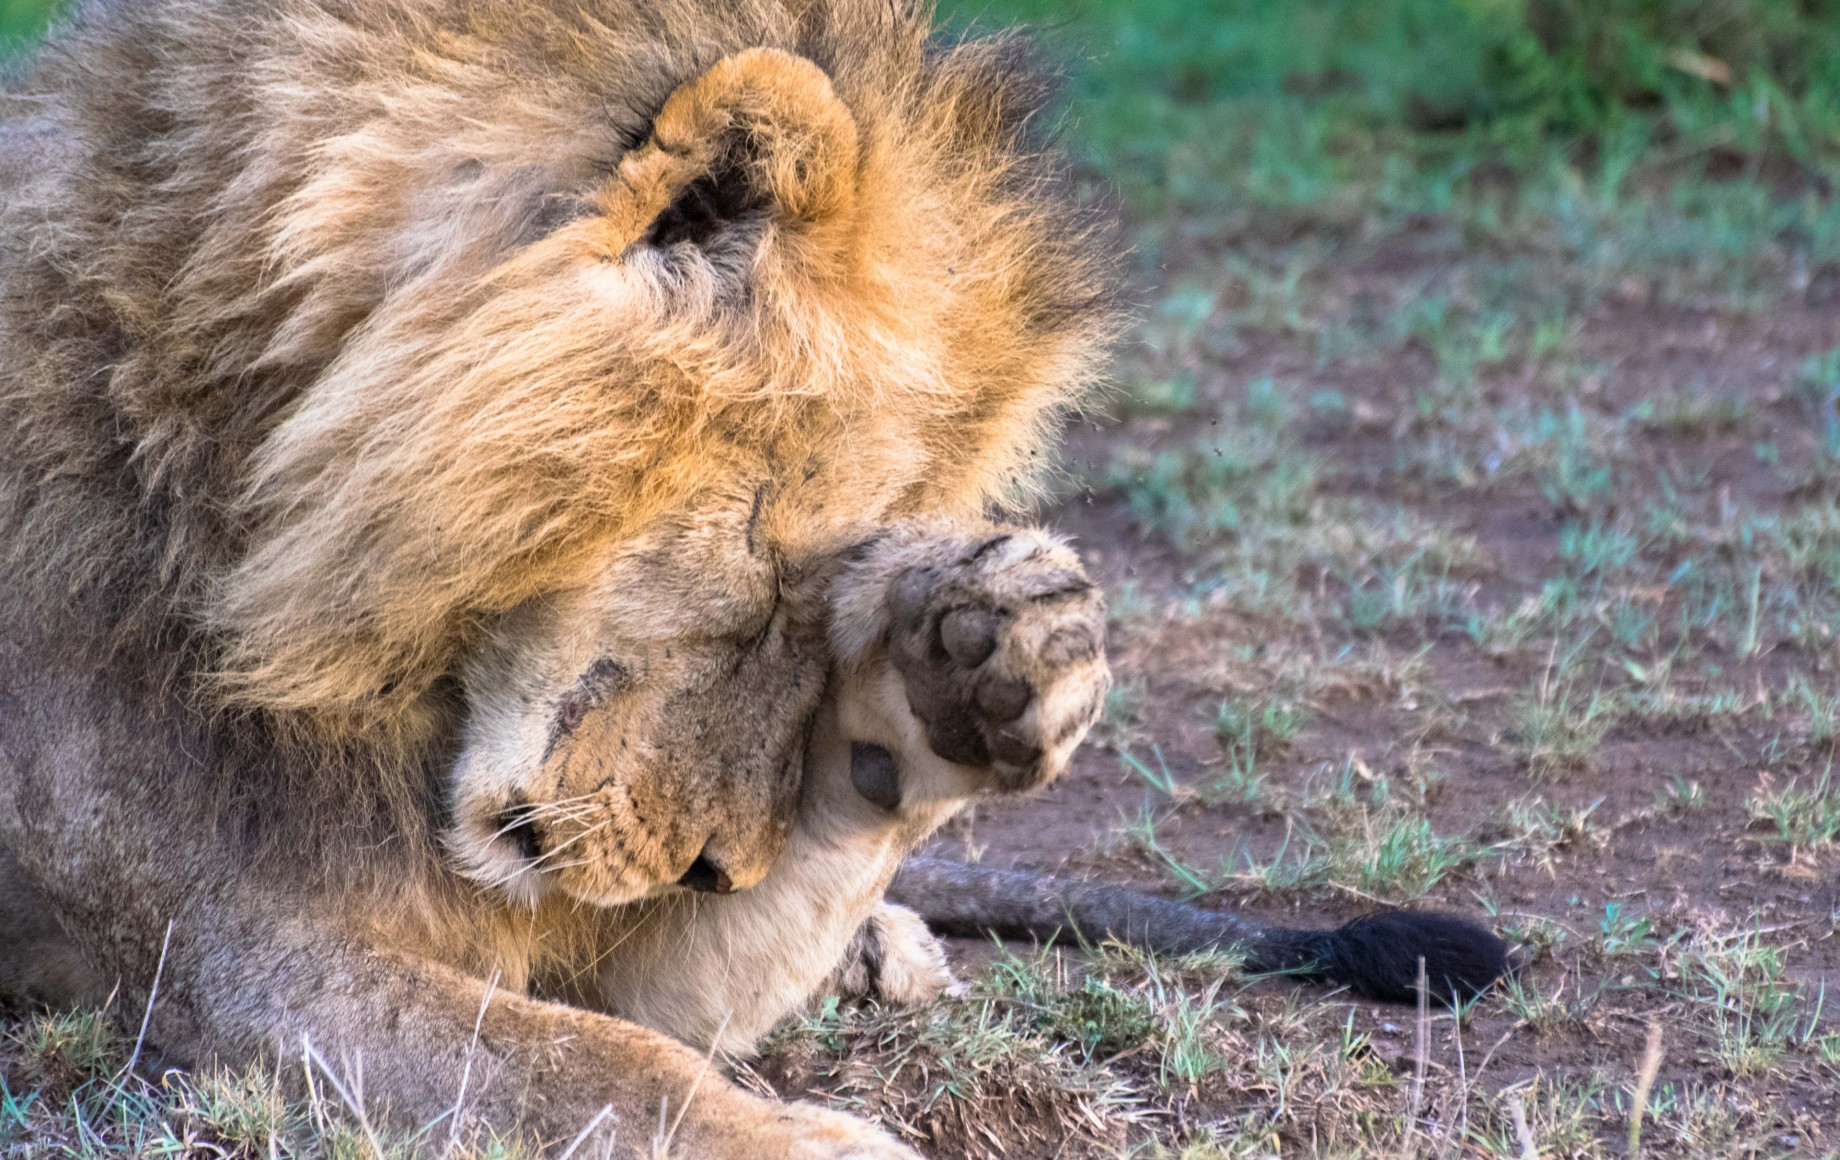 a lion paws his face